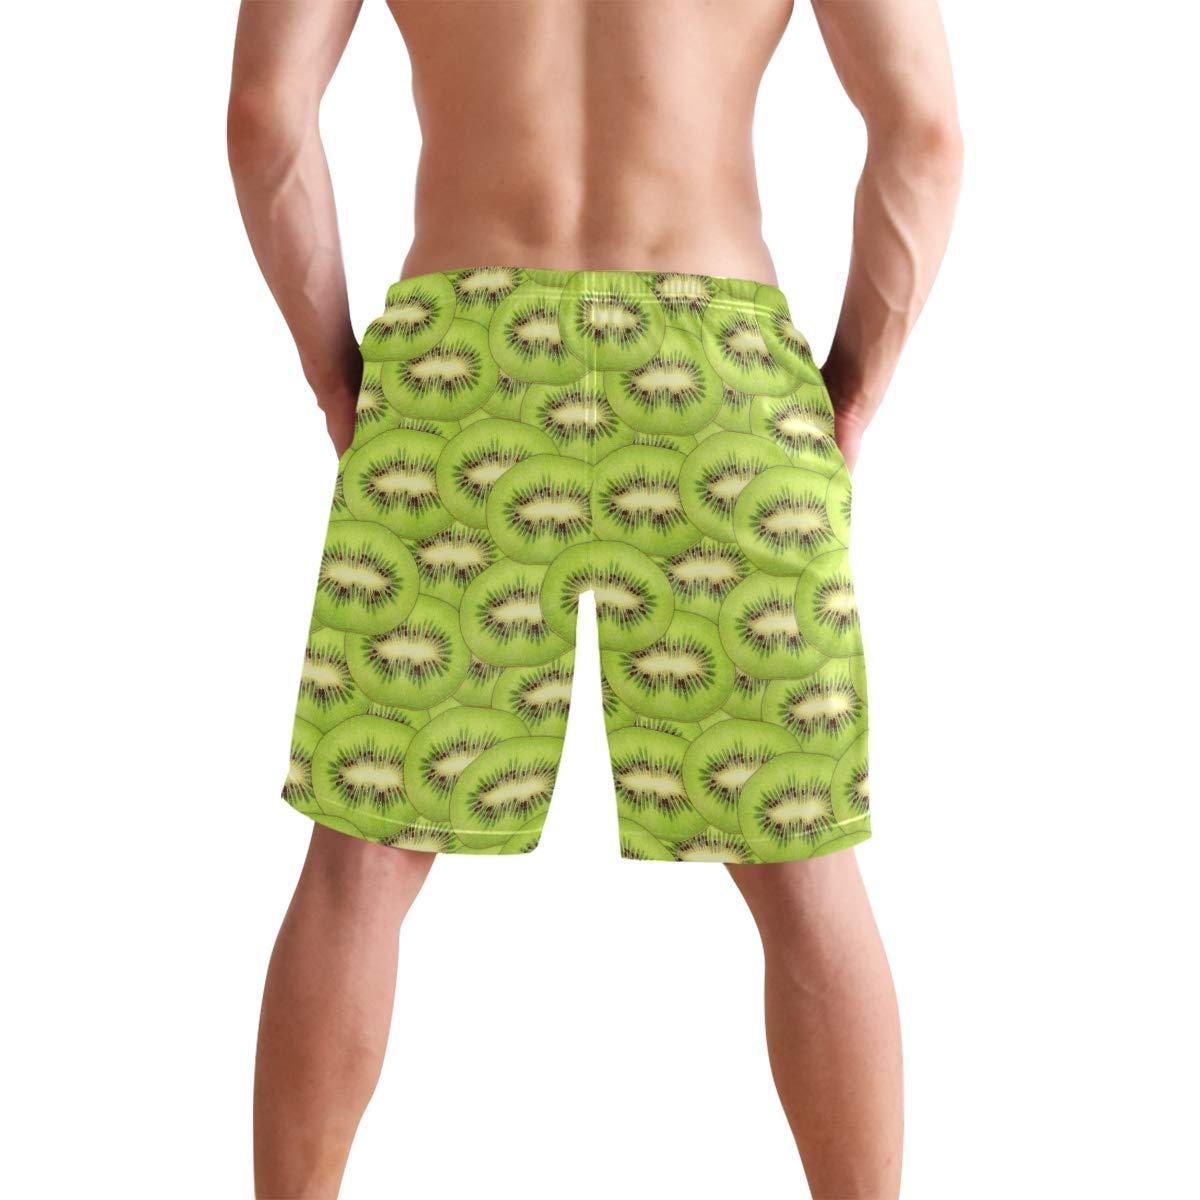 DongDongQiang Men Summer Green Kiwi Fruit Quick Dry Volleyball Beach Shorts Board Shorts